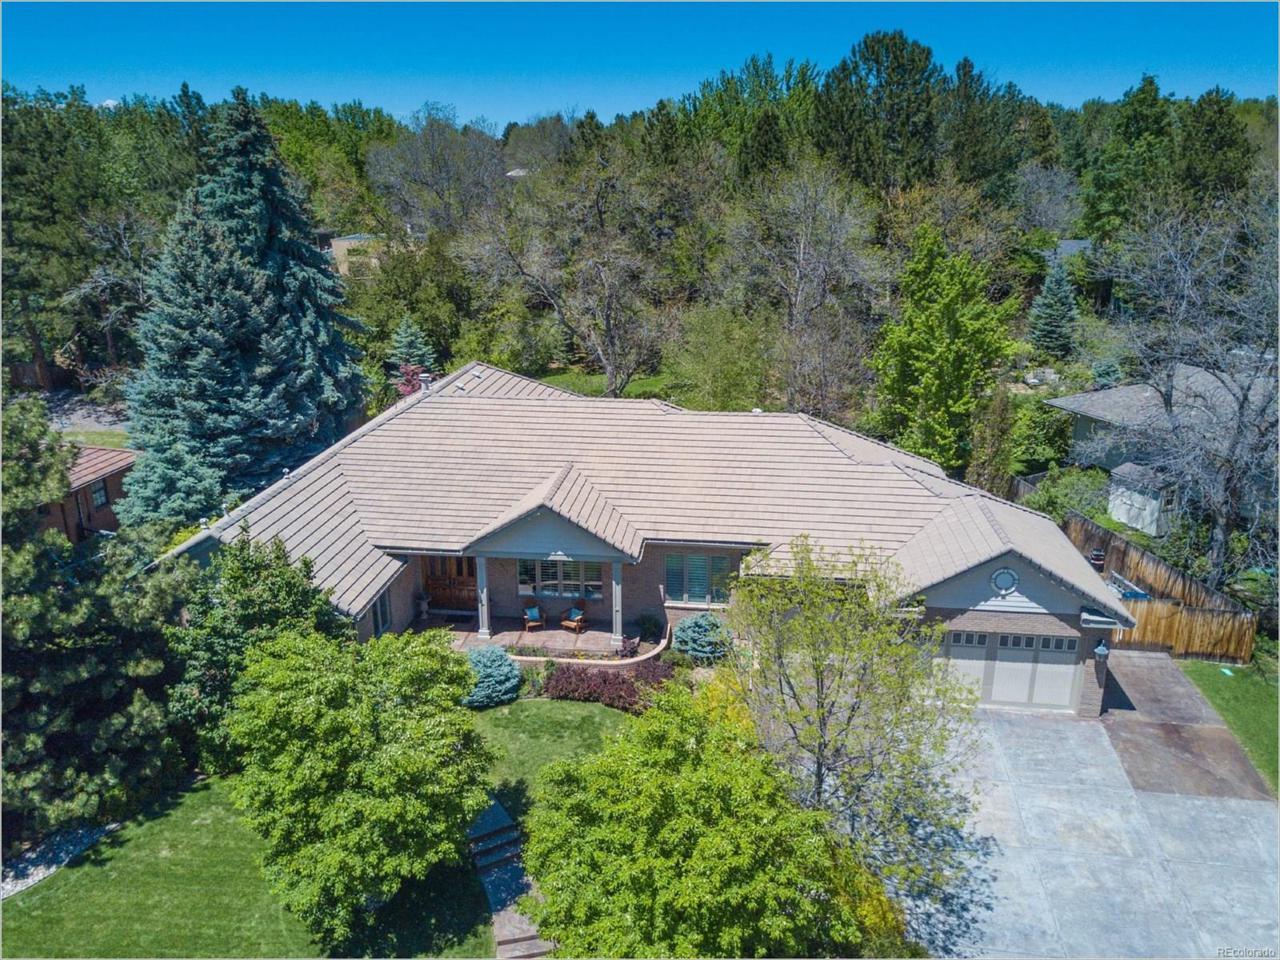 4011 S Hudson Way, Englewood, CO 80113 (MLS #6600339) :: 8z Real Estate